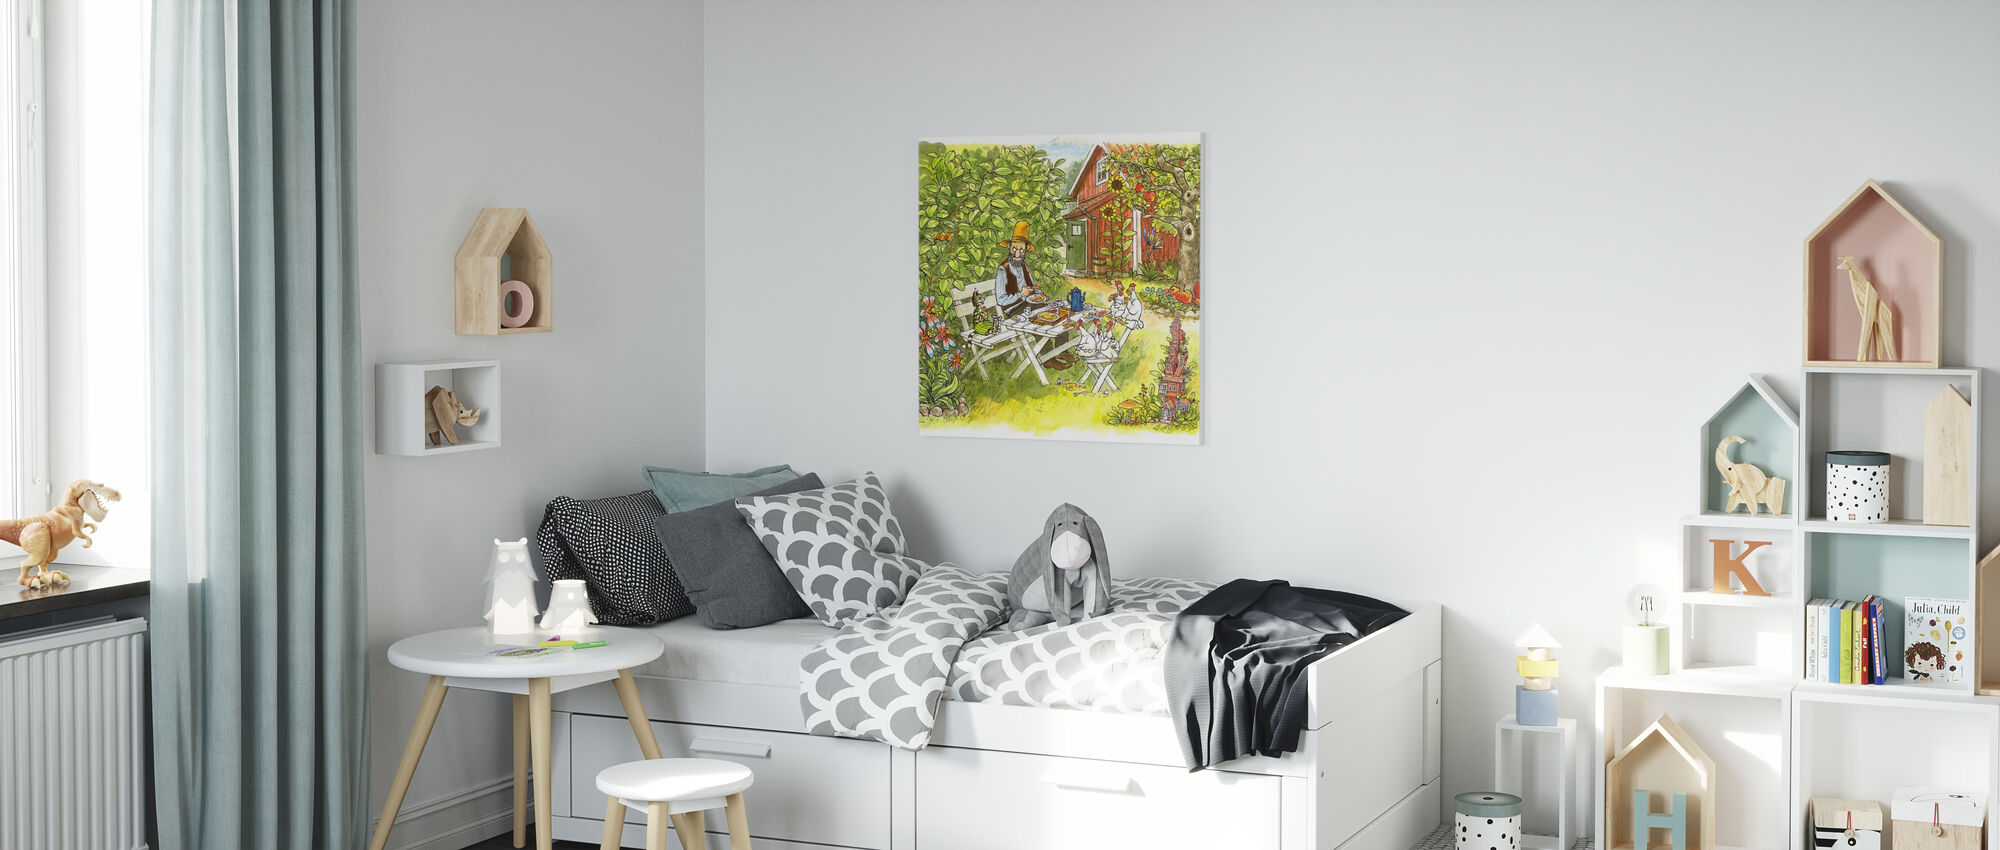 Pettson en Findus - Pannenkoekenlunch in de tuin - Canvas print - Kinderkamer